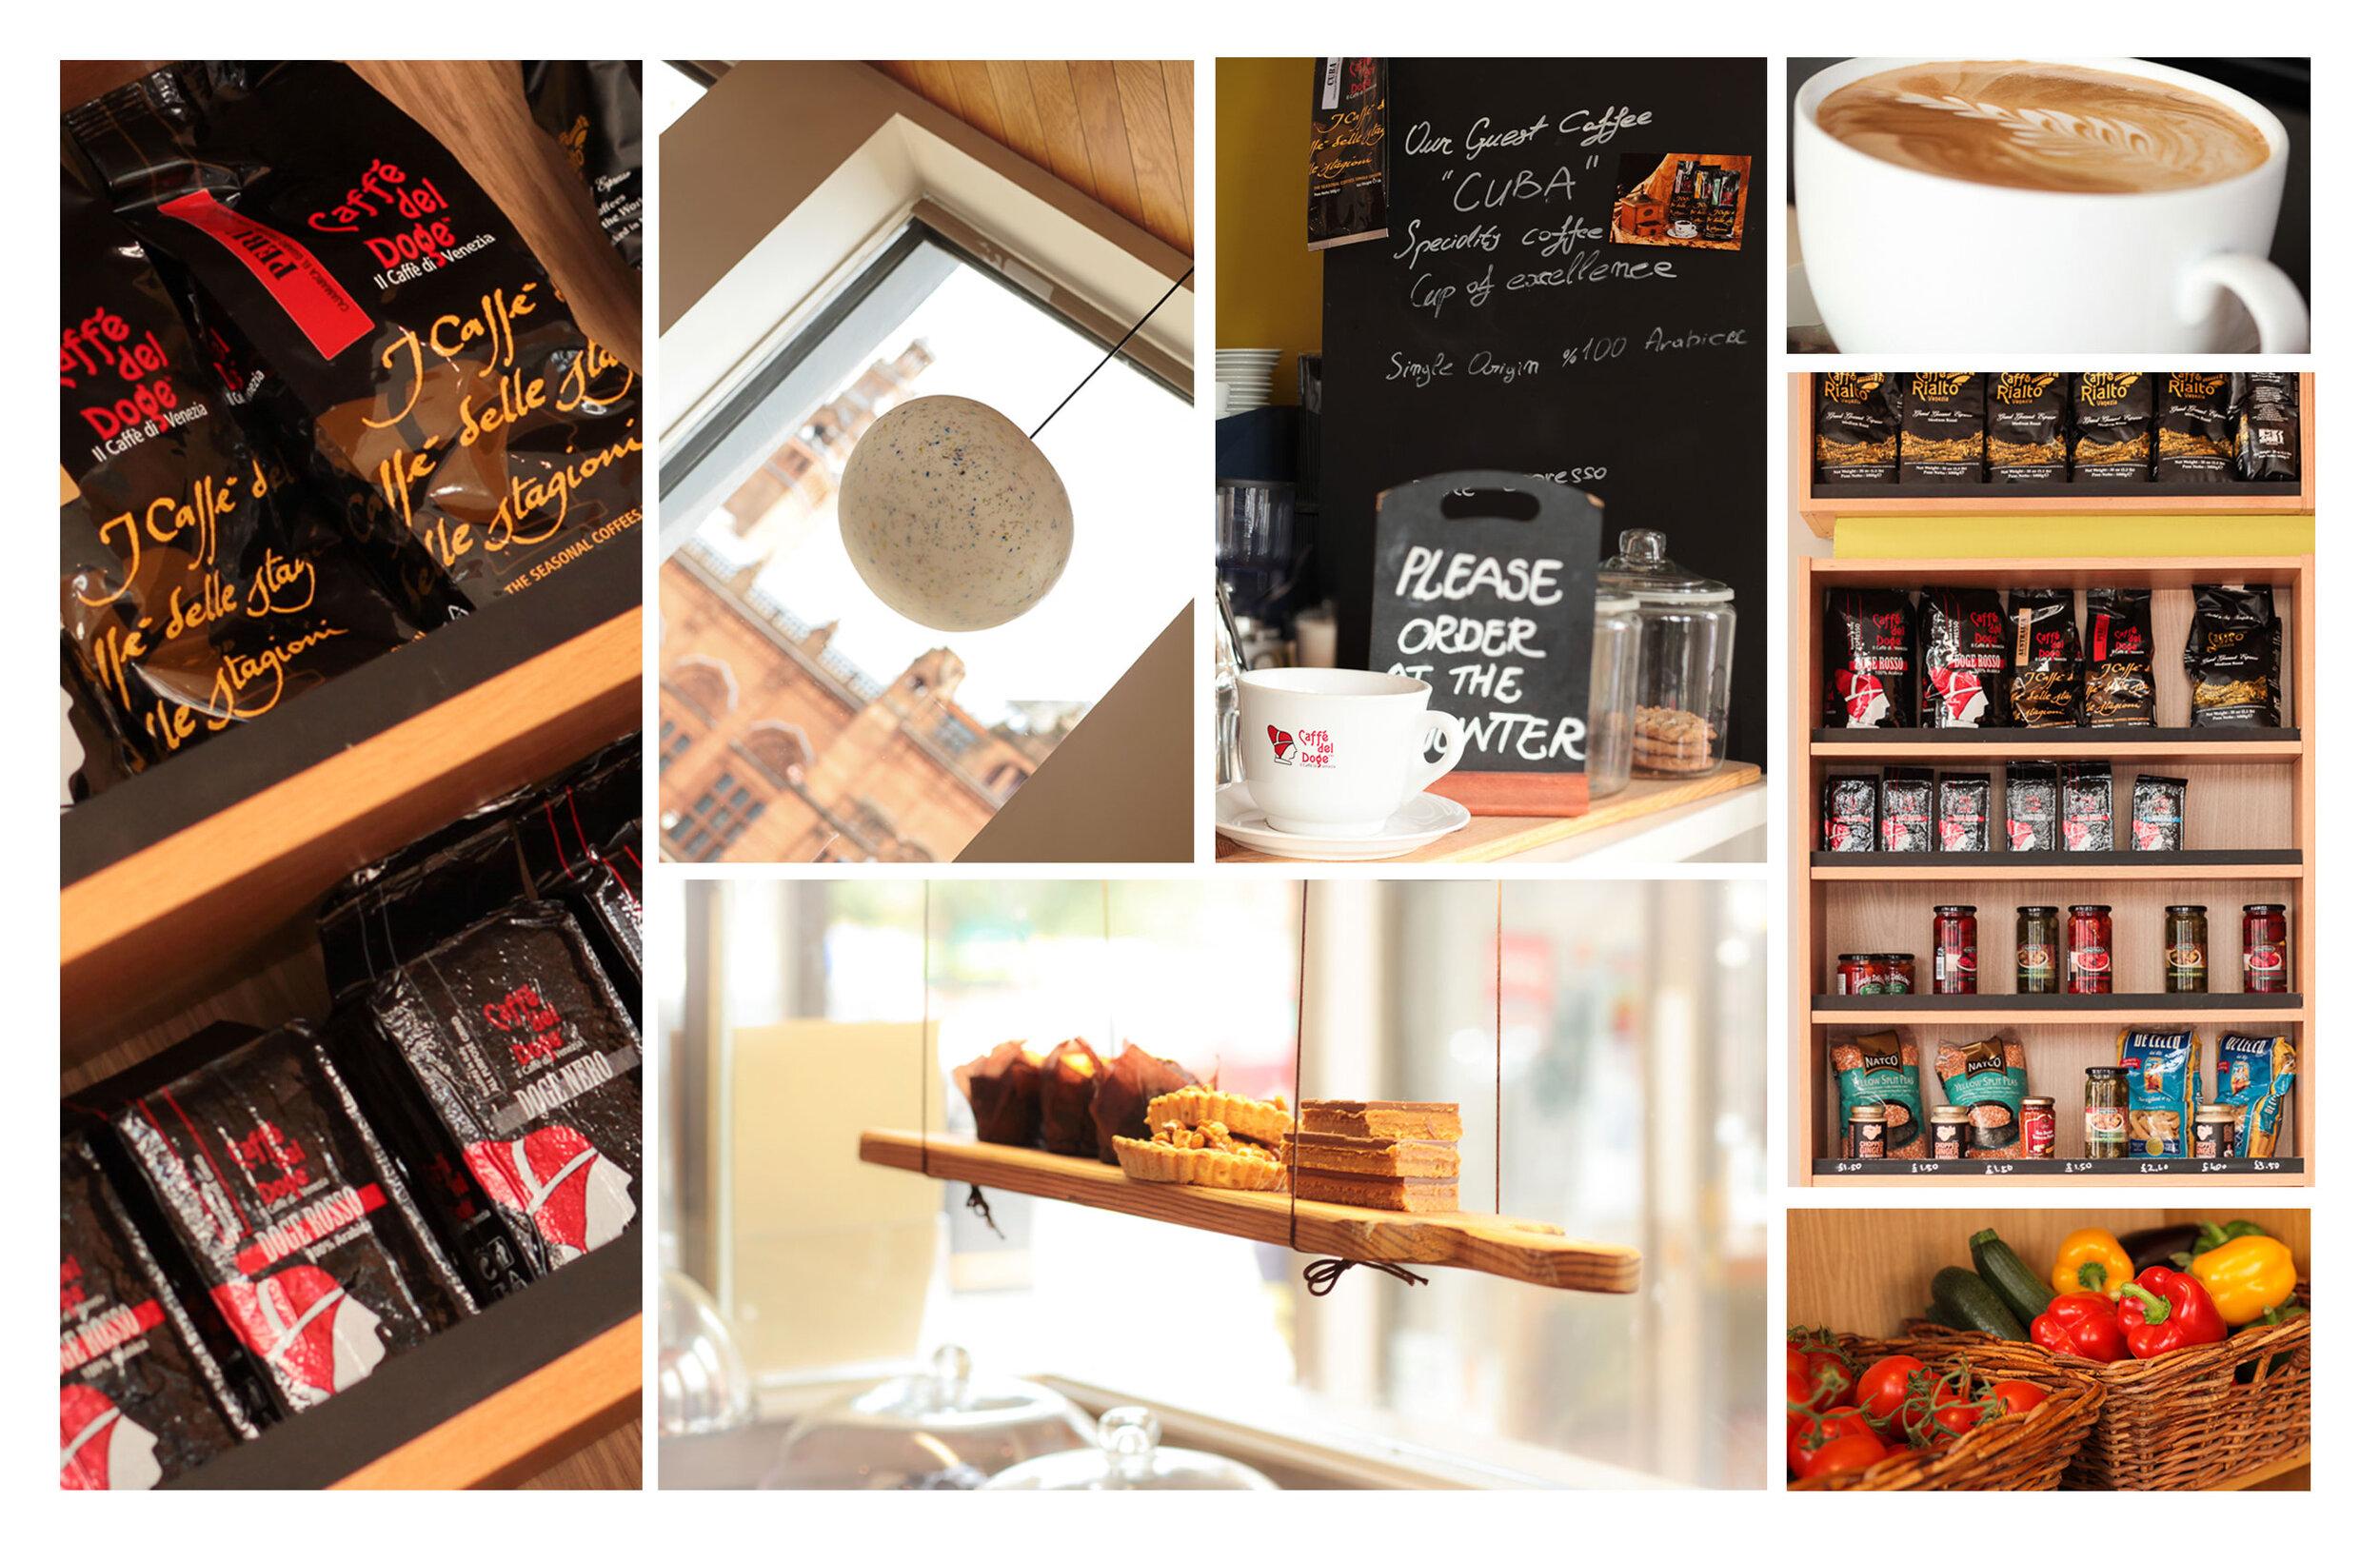 Food_photography_by_Stefania_Calderara_TheLittleCafe_Comp.jpg